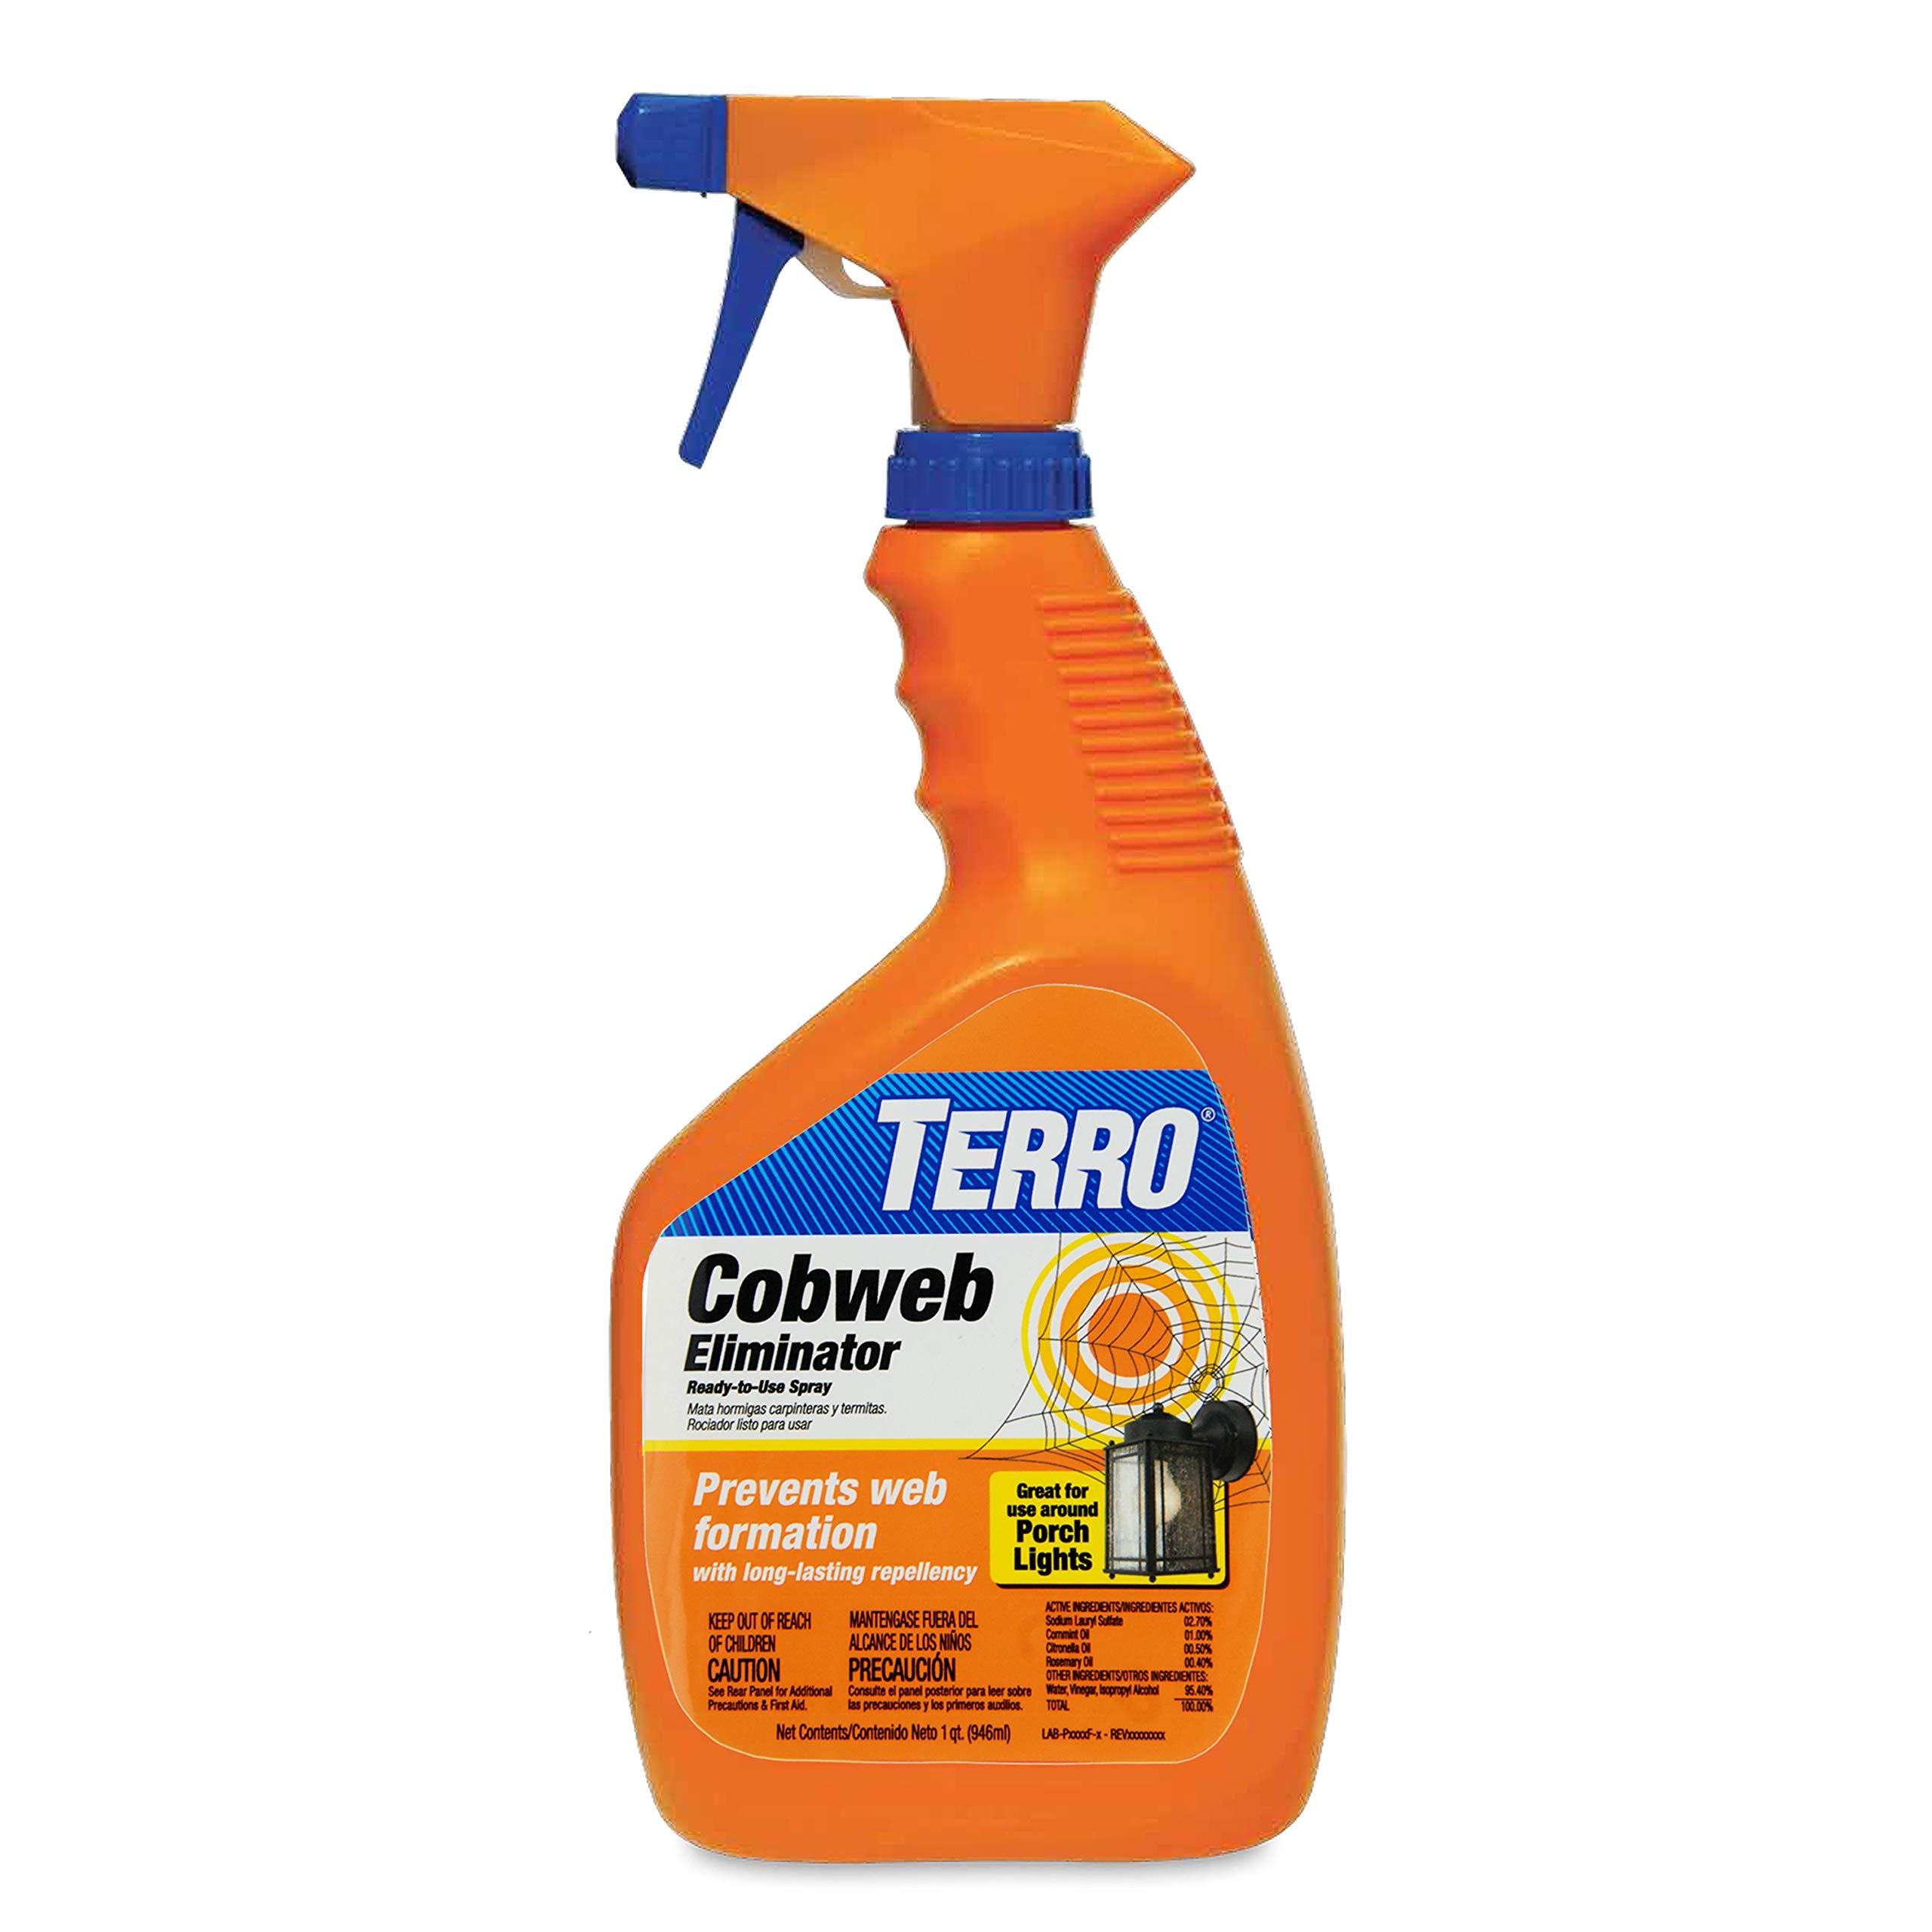 Terro T2360 Cobweb Eliminator 1 quart (946 ml) by Terro